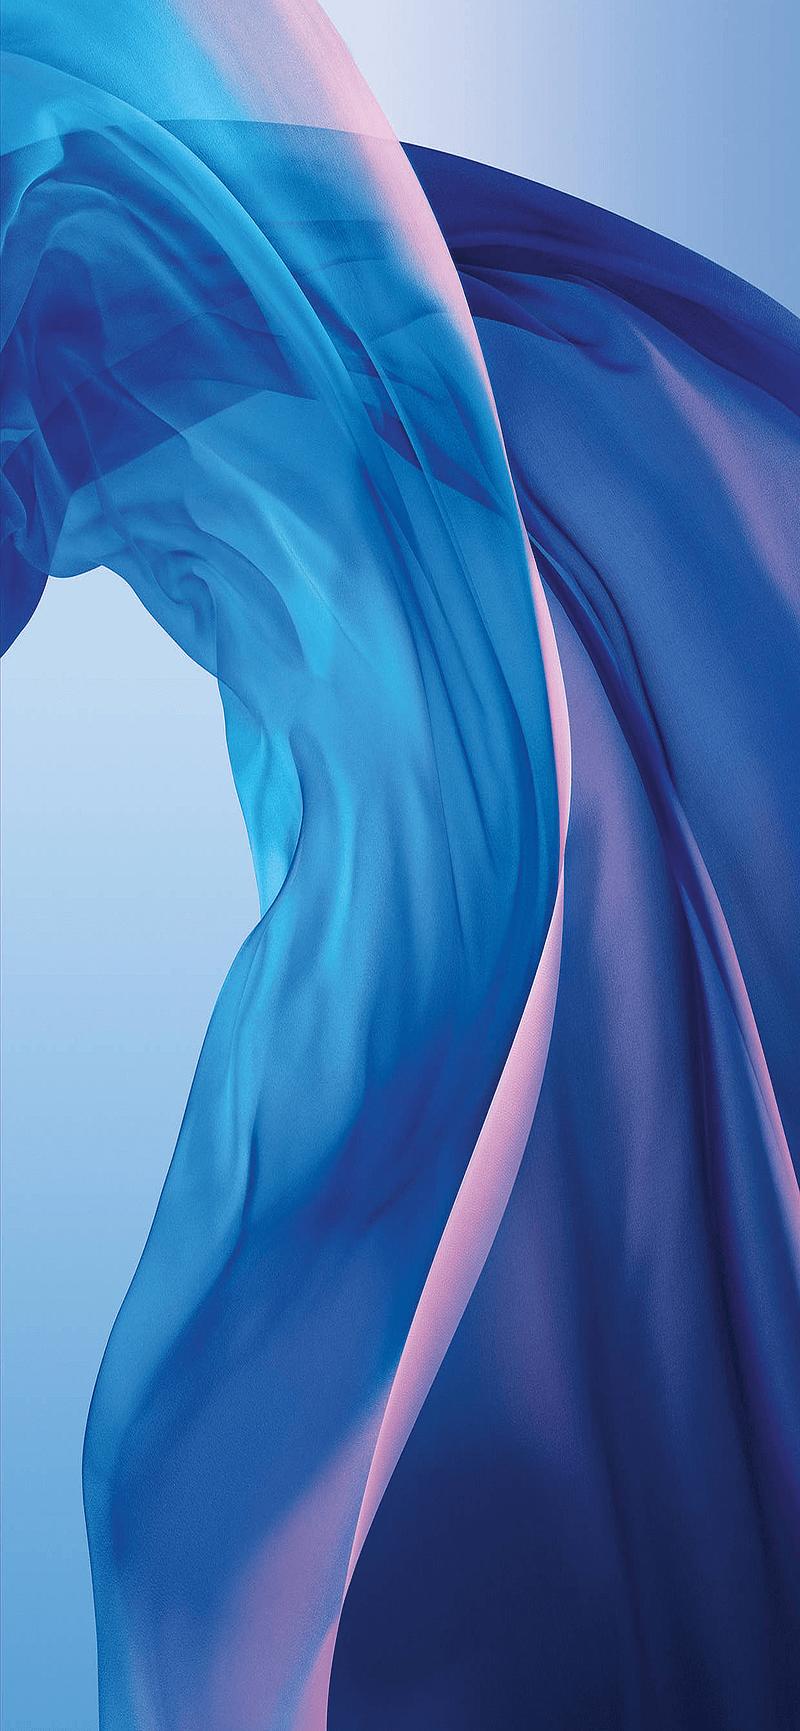 Download New Ipad Pro Macbook Air Wallpapers For Iphone Ipad Macbook Air Wallpaper Macbook Wallpaper Best Iphone Wallpapers